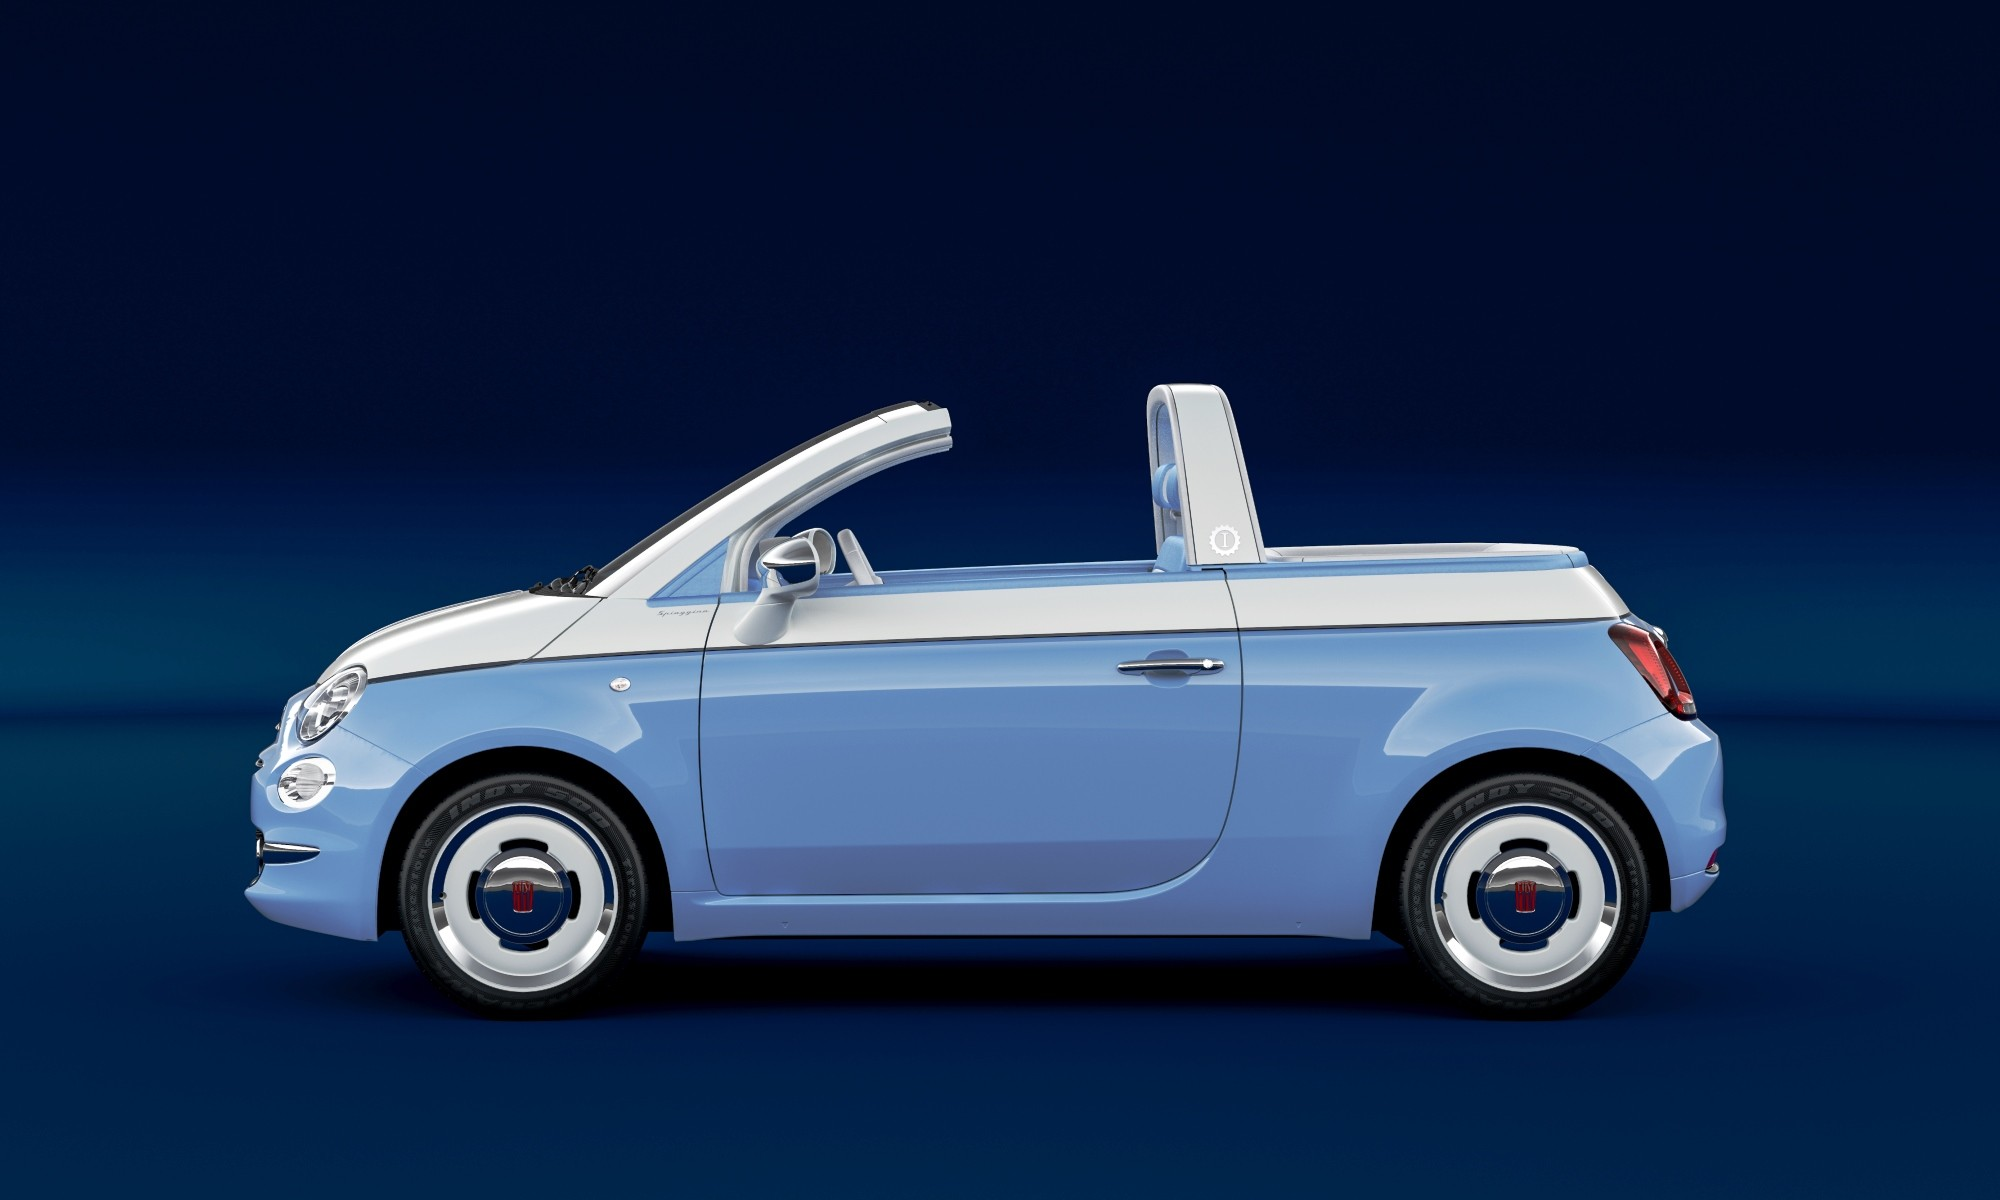 Fiat 500 Spiaggina with regular windscreen